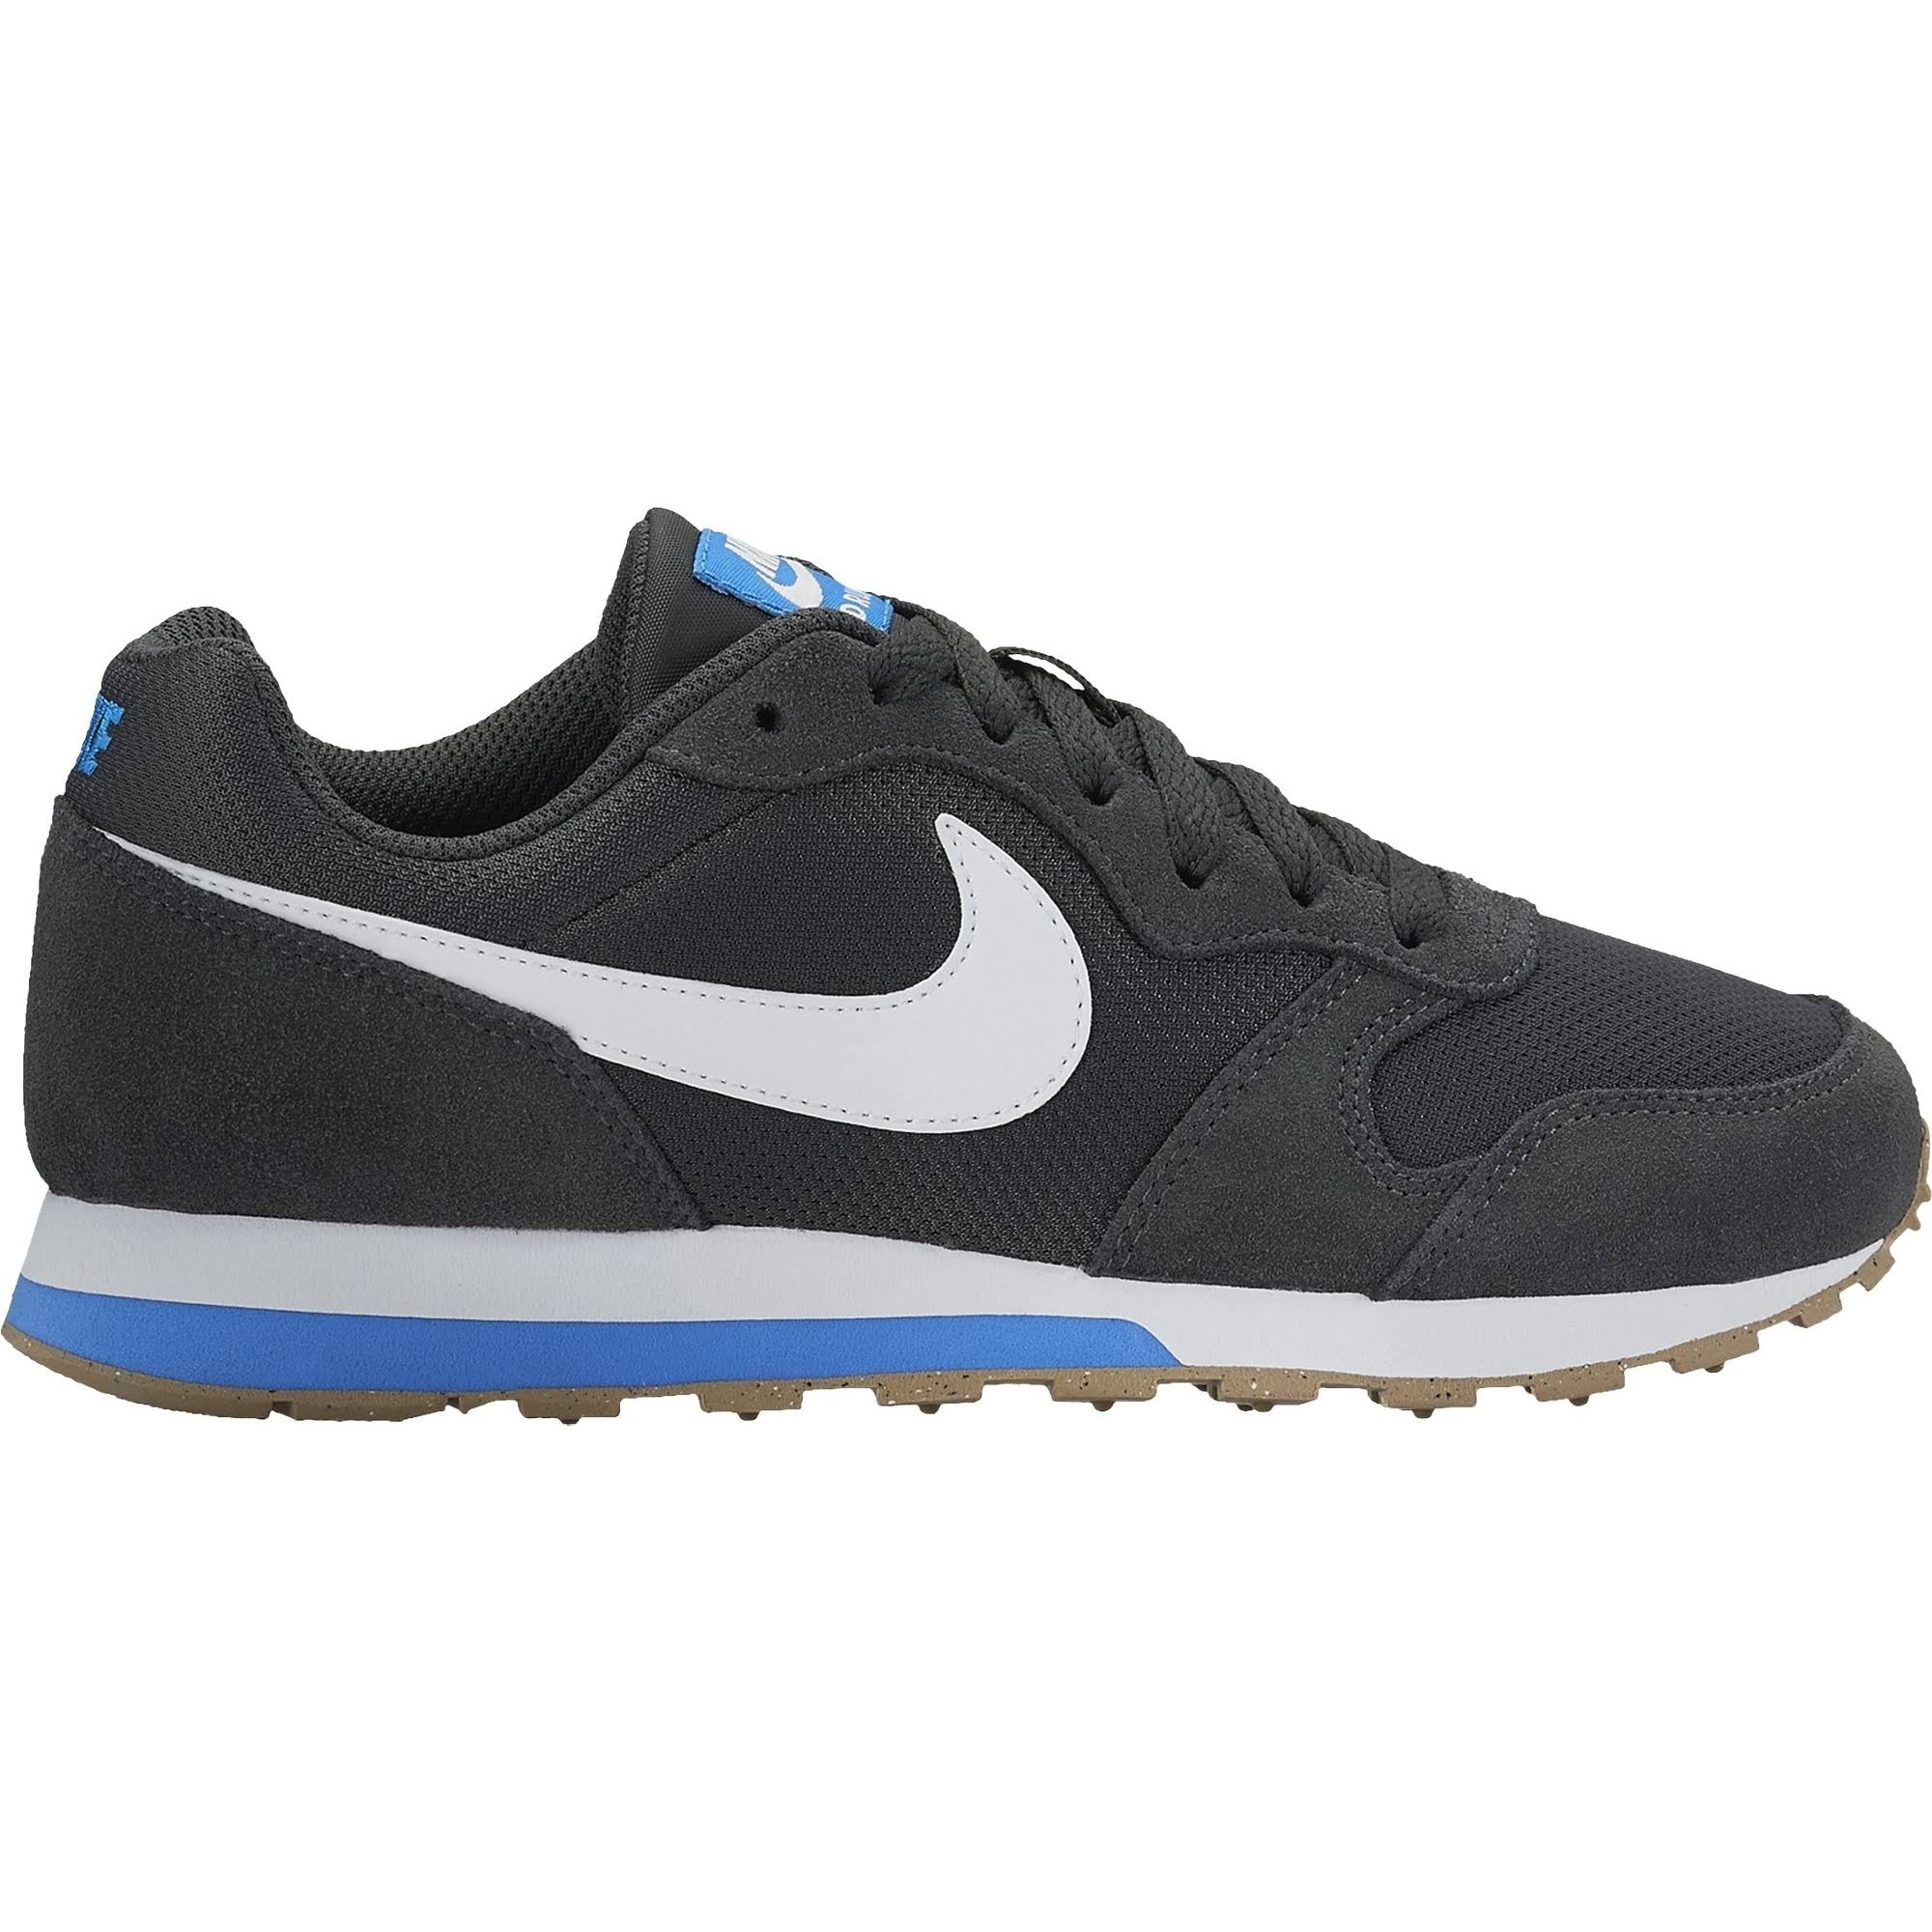 Grau 36 Kinderschuhe Gs blau Größe Nike Md Eu 807316 007 Runner 5 Weiß grau qxY8xR